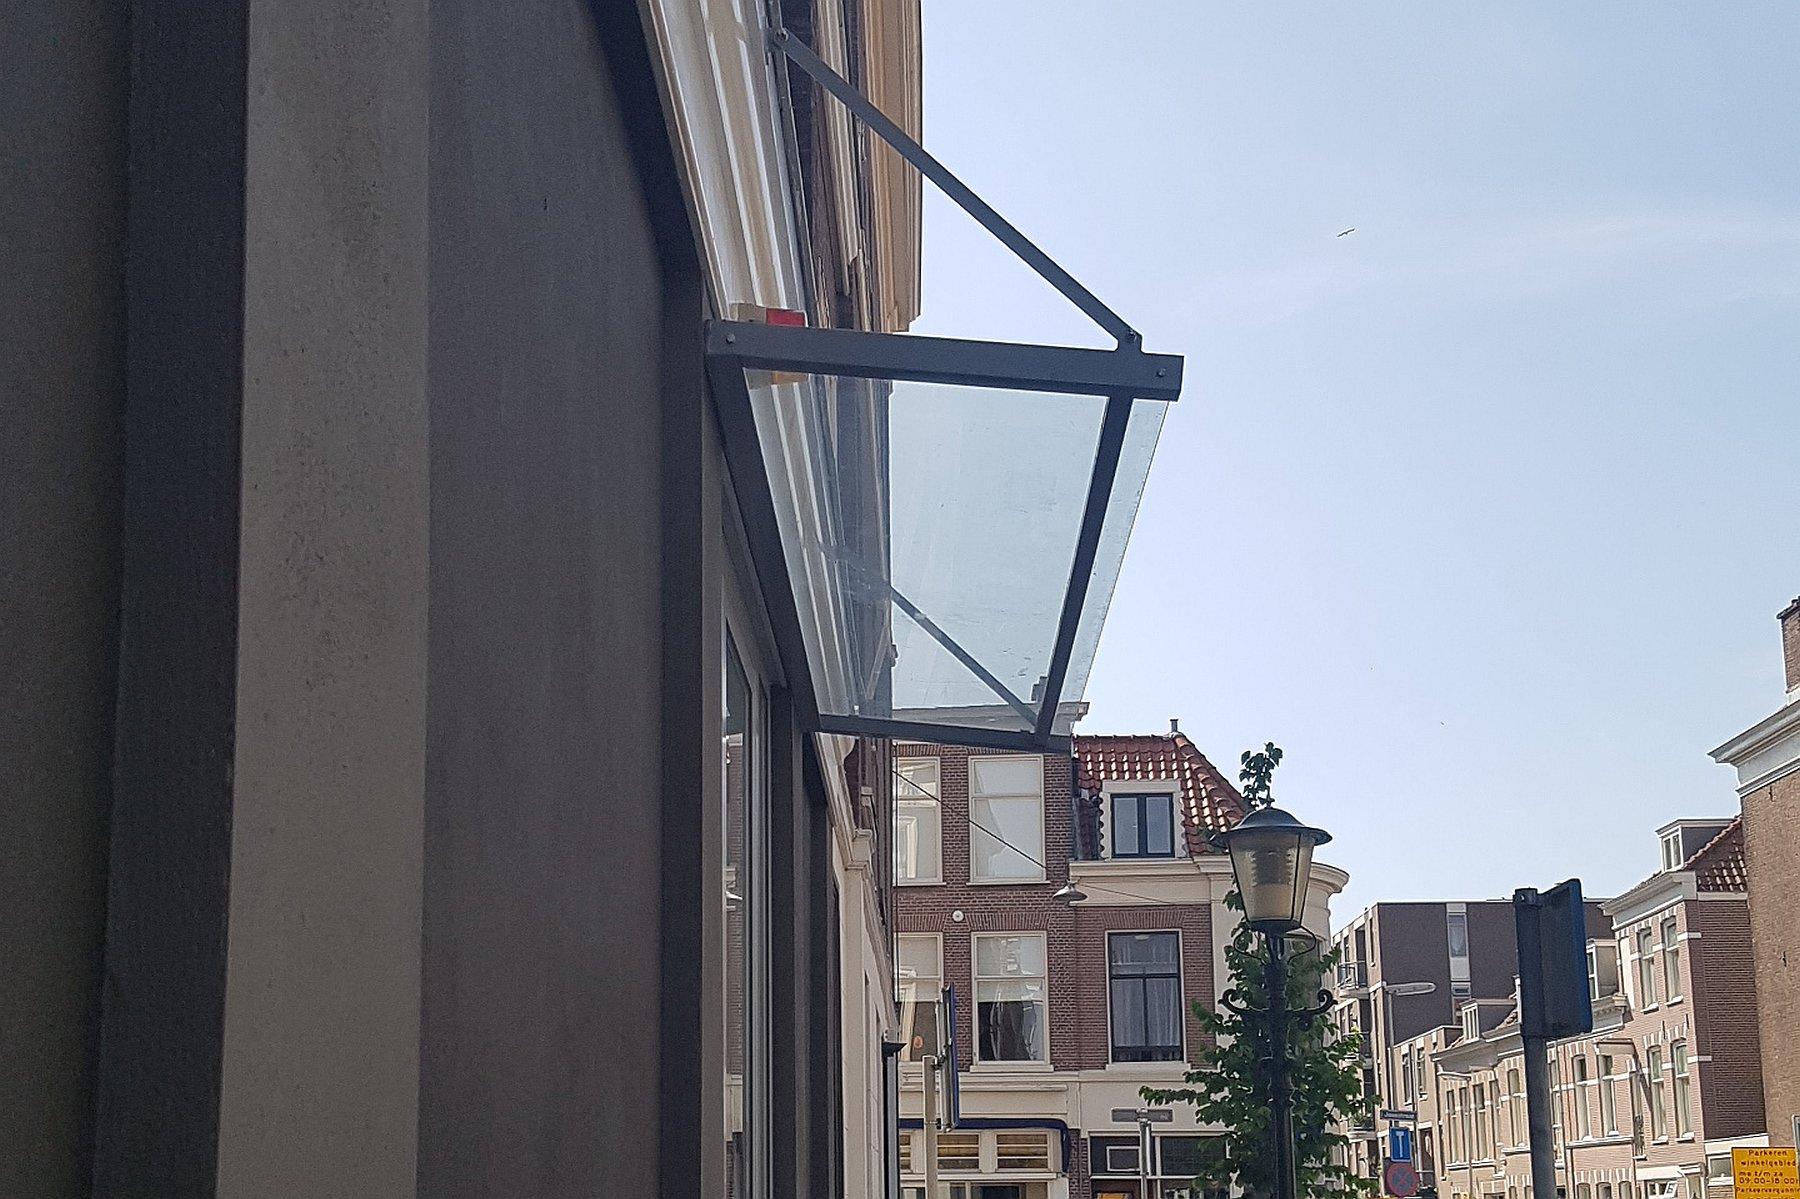 757032995e89a8 Kapot glas in overkapping vervangen te Den Haag